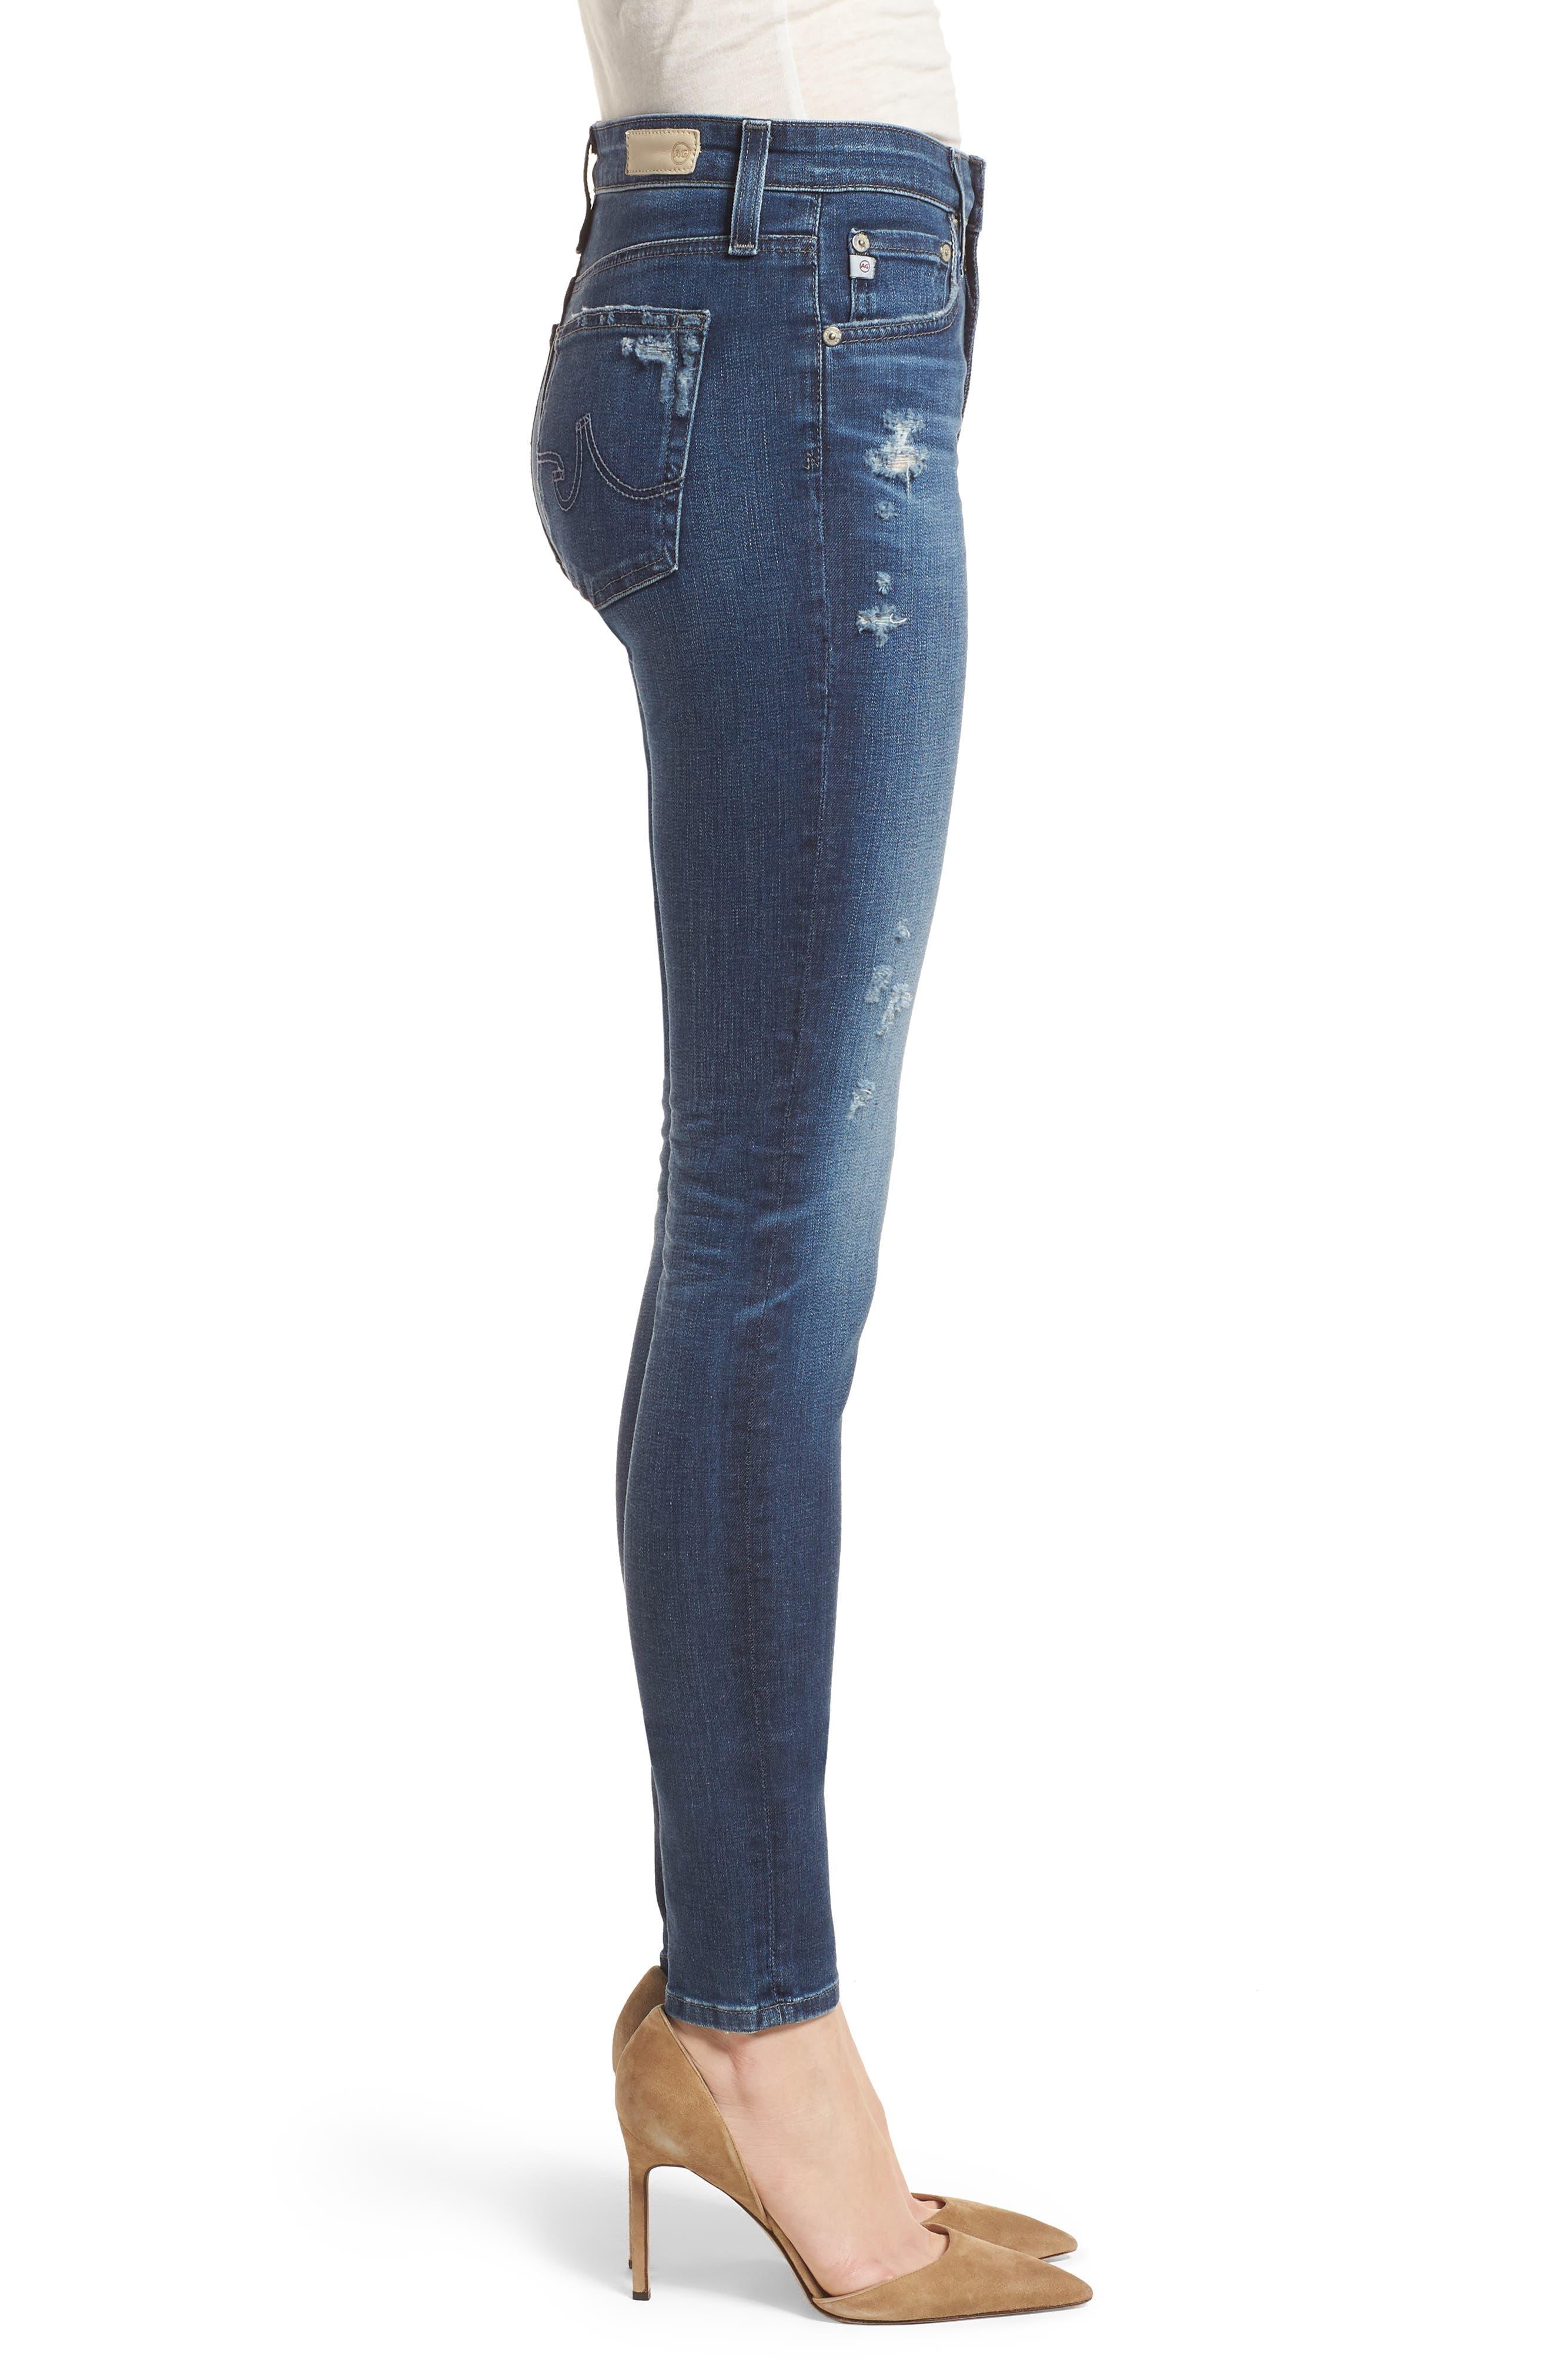 'The Farrah' High Rise Skinny Jeans,                             Alternate thumbnail 24, color,